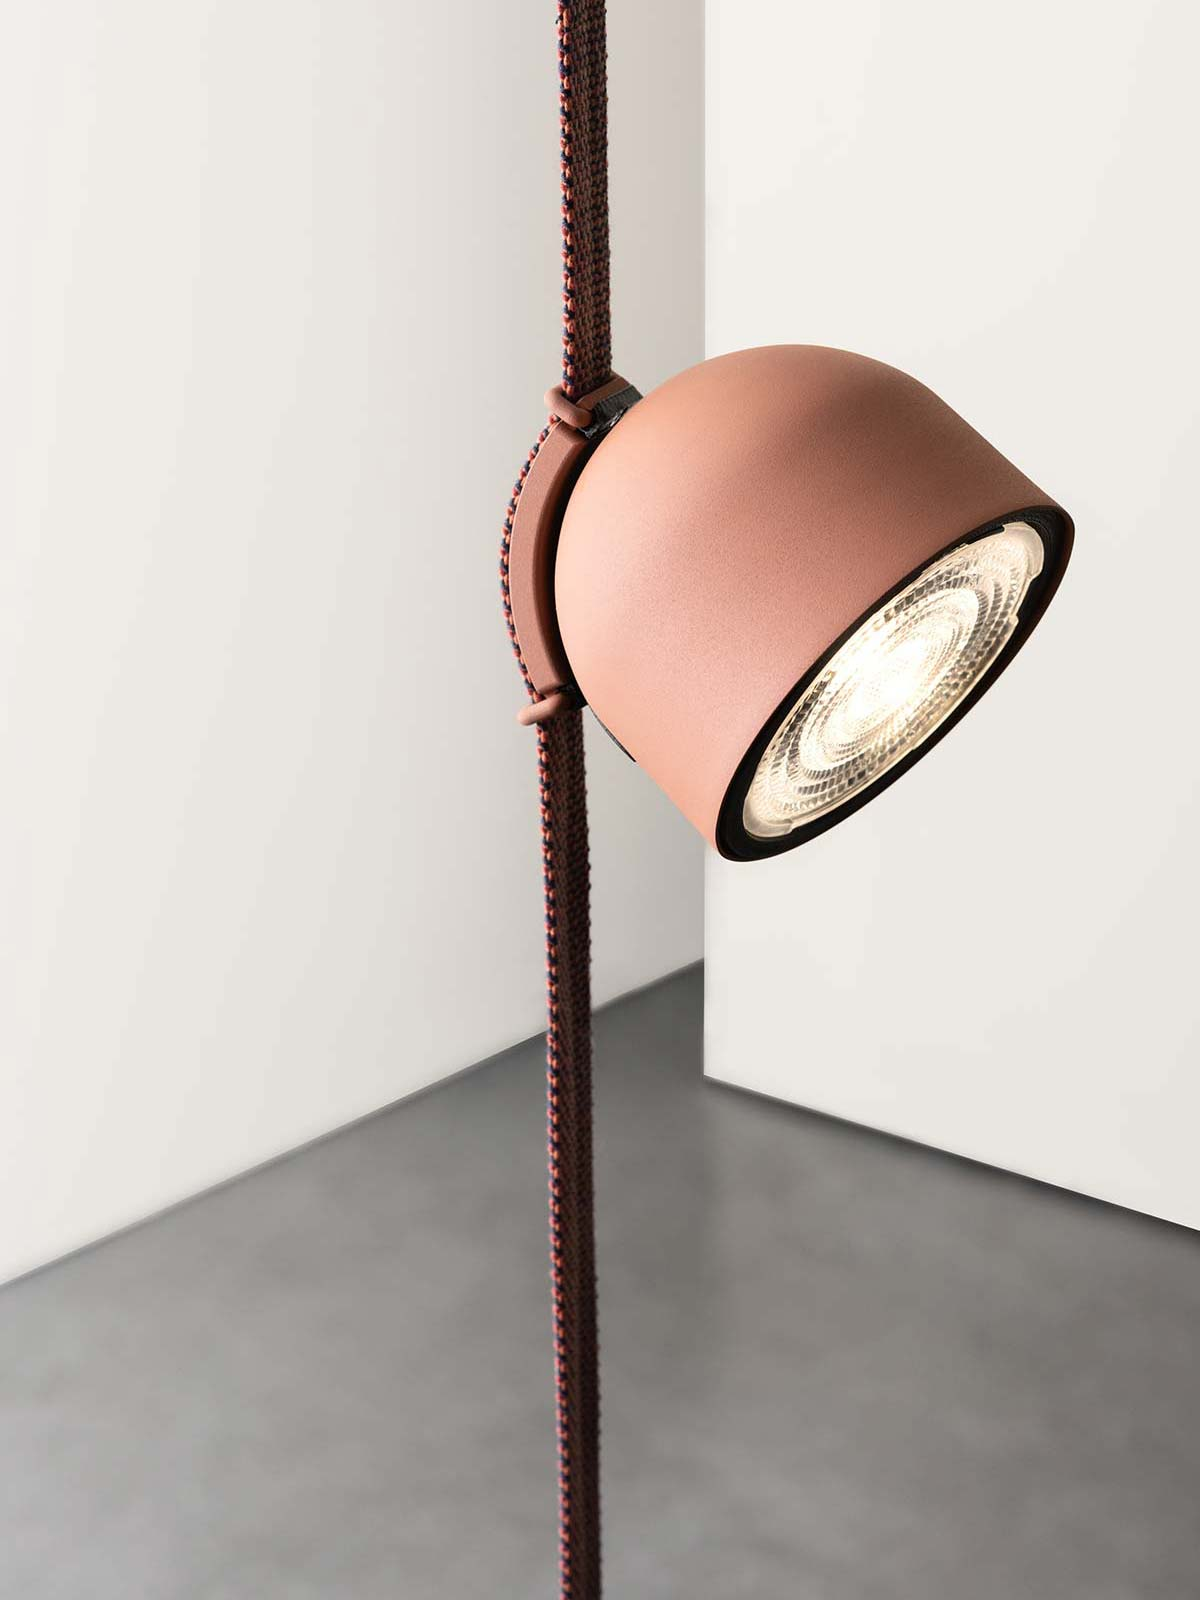 Plusminus by Vibia, Design Stefan Diez - Photo © Daniela Trost